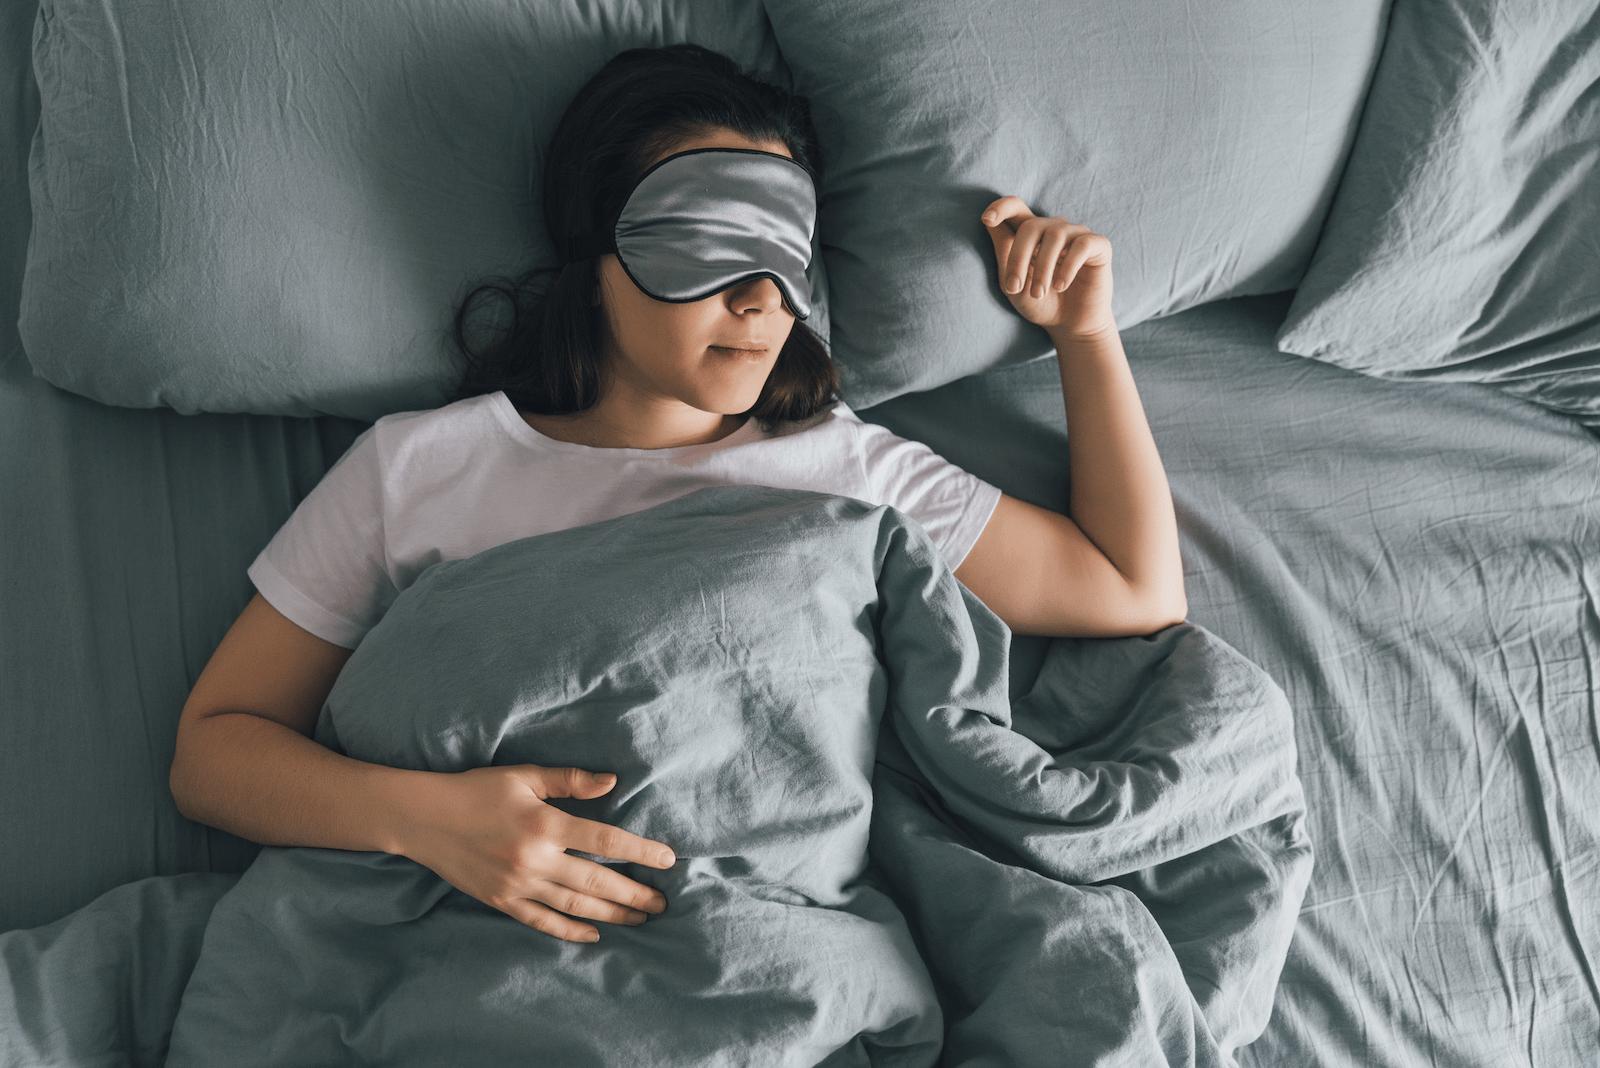 poor sleep hygiene: woman sleeping with an eye mask